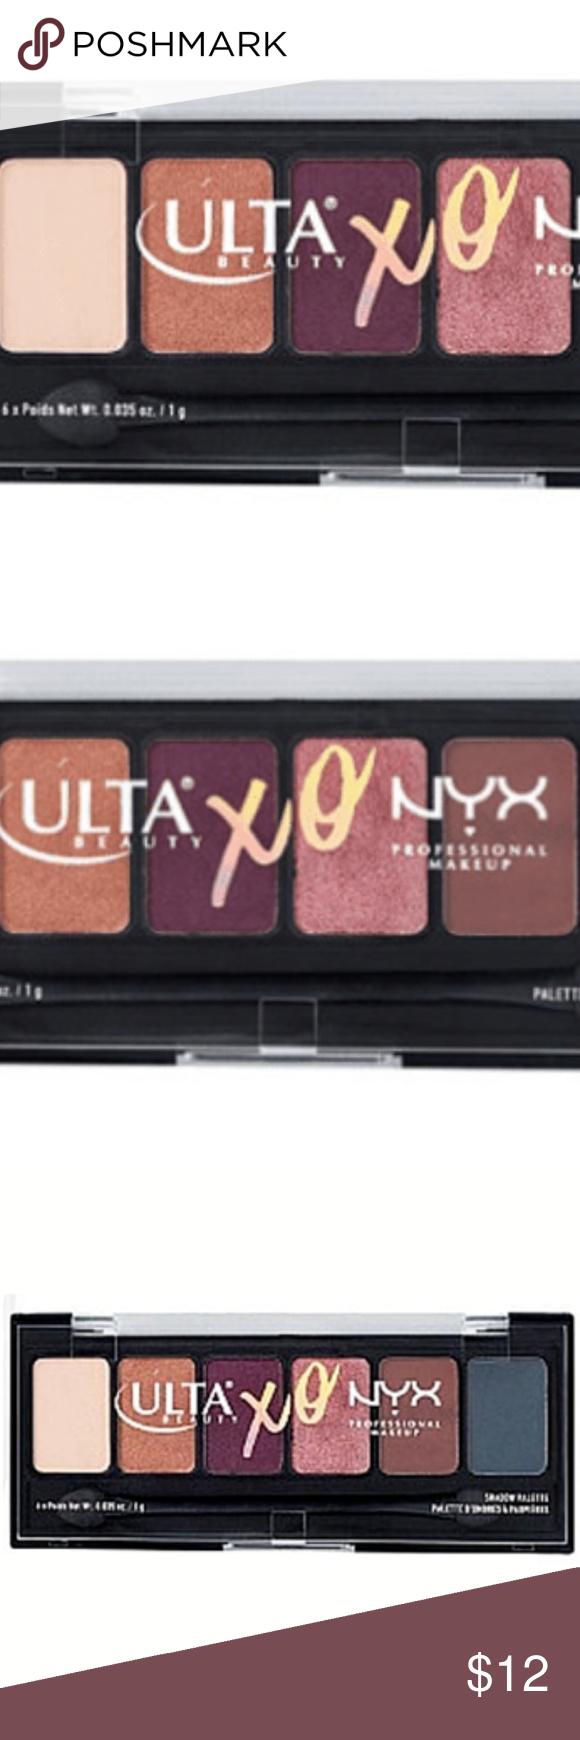 Ulta XO NYX Professional Makeup Eye Shadow Palette New